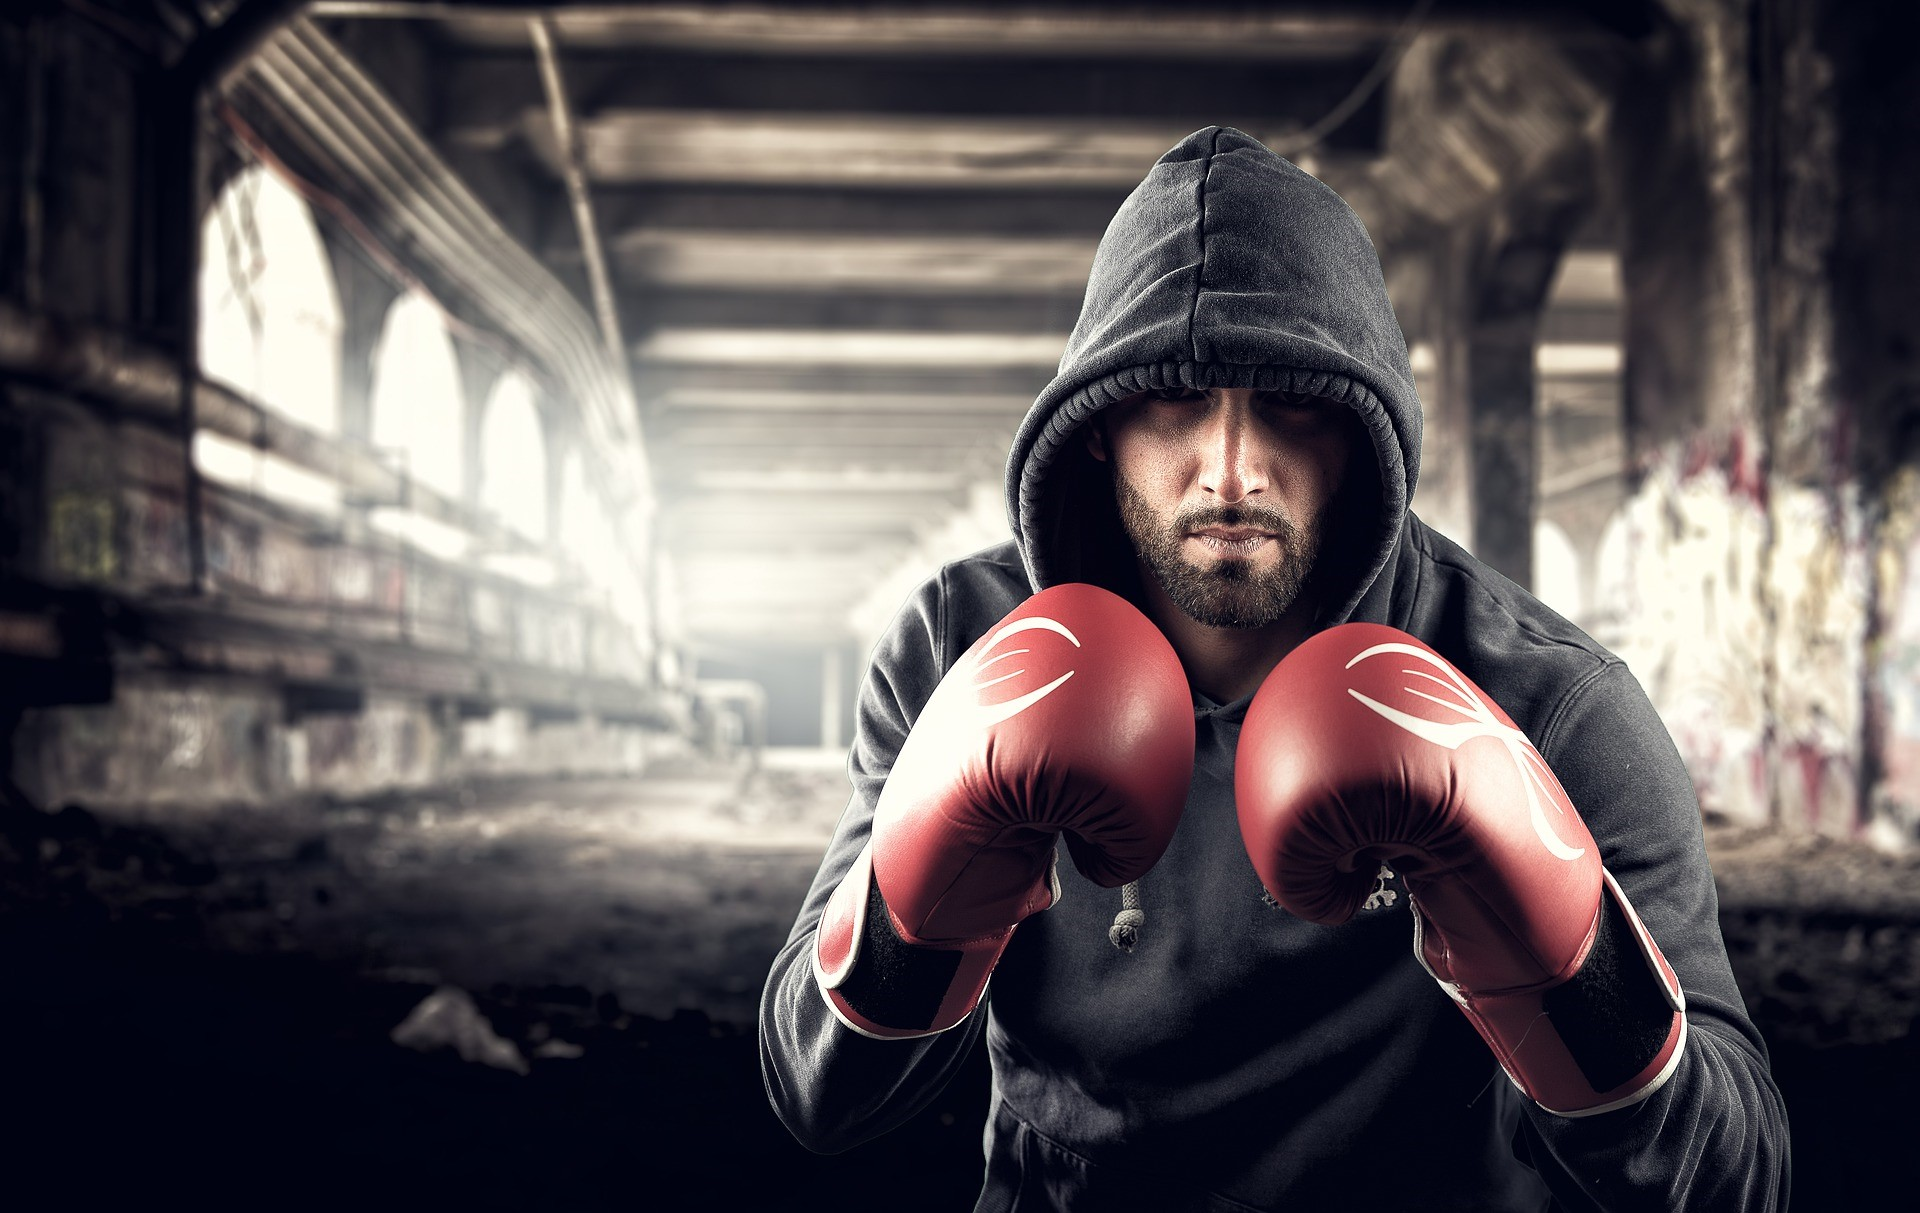 Anaxco IT-Sicherheit Teaserbild Boxer Cybersecurity IT-Sicherheit Datensicherheit Cyberkriminalität Cloud Hackerangriff